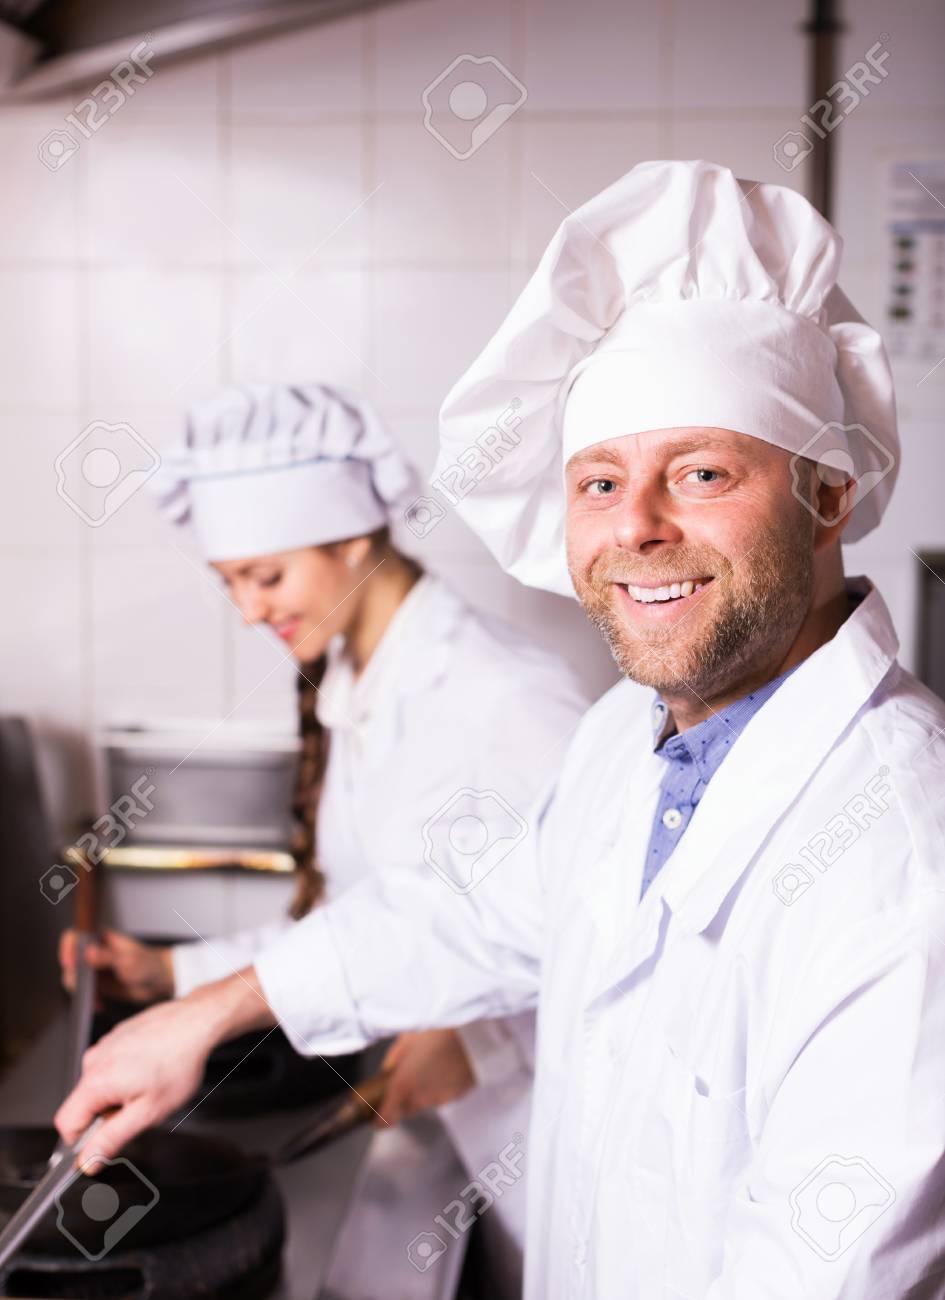 La Cuisine De Bistrot sourire cuisiniers accueillir les clients à la cuisine de bistrot